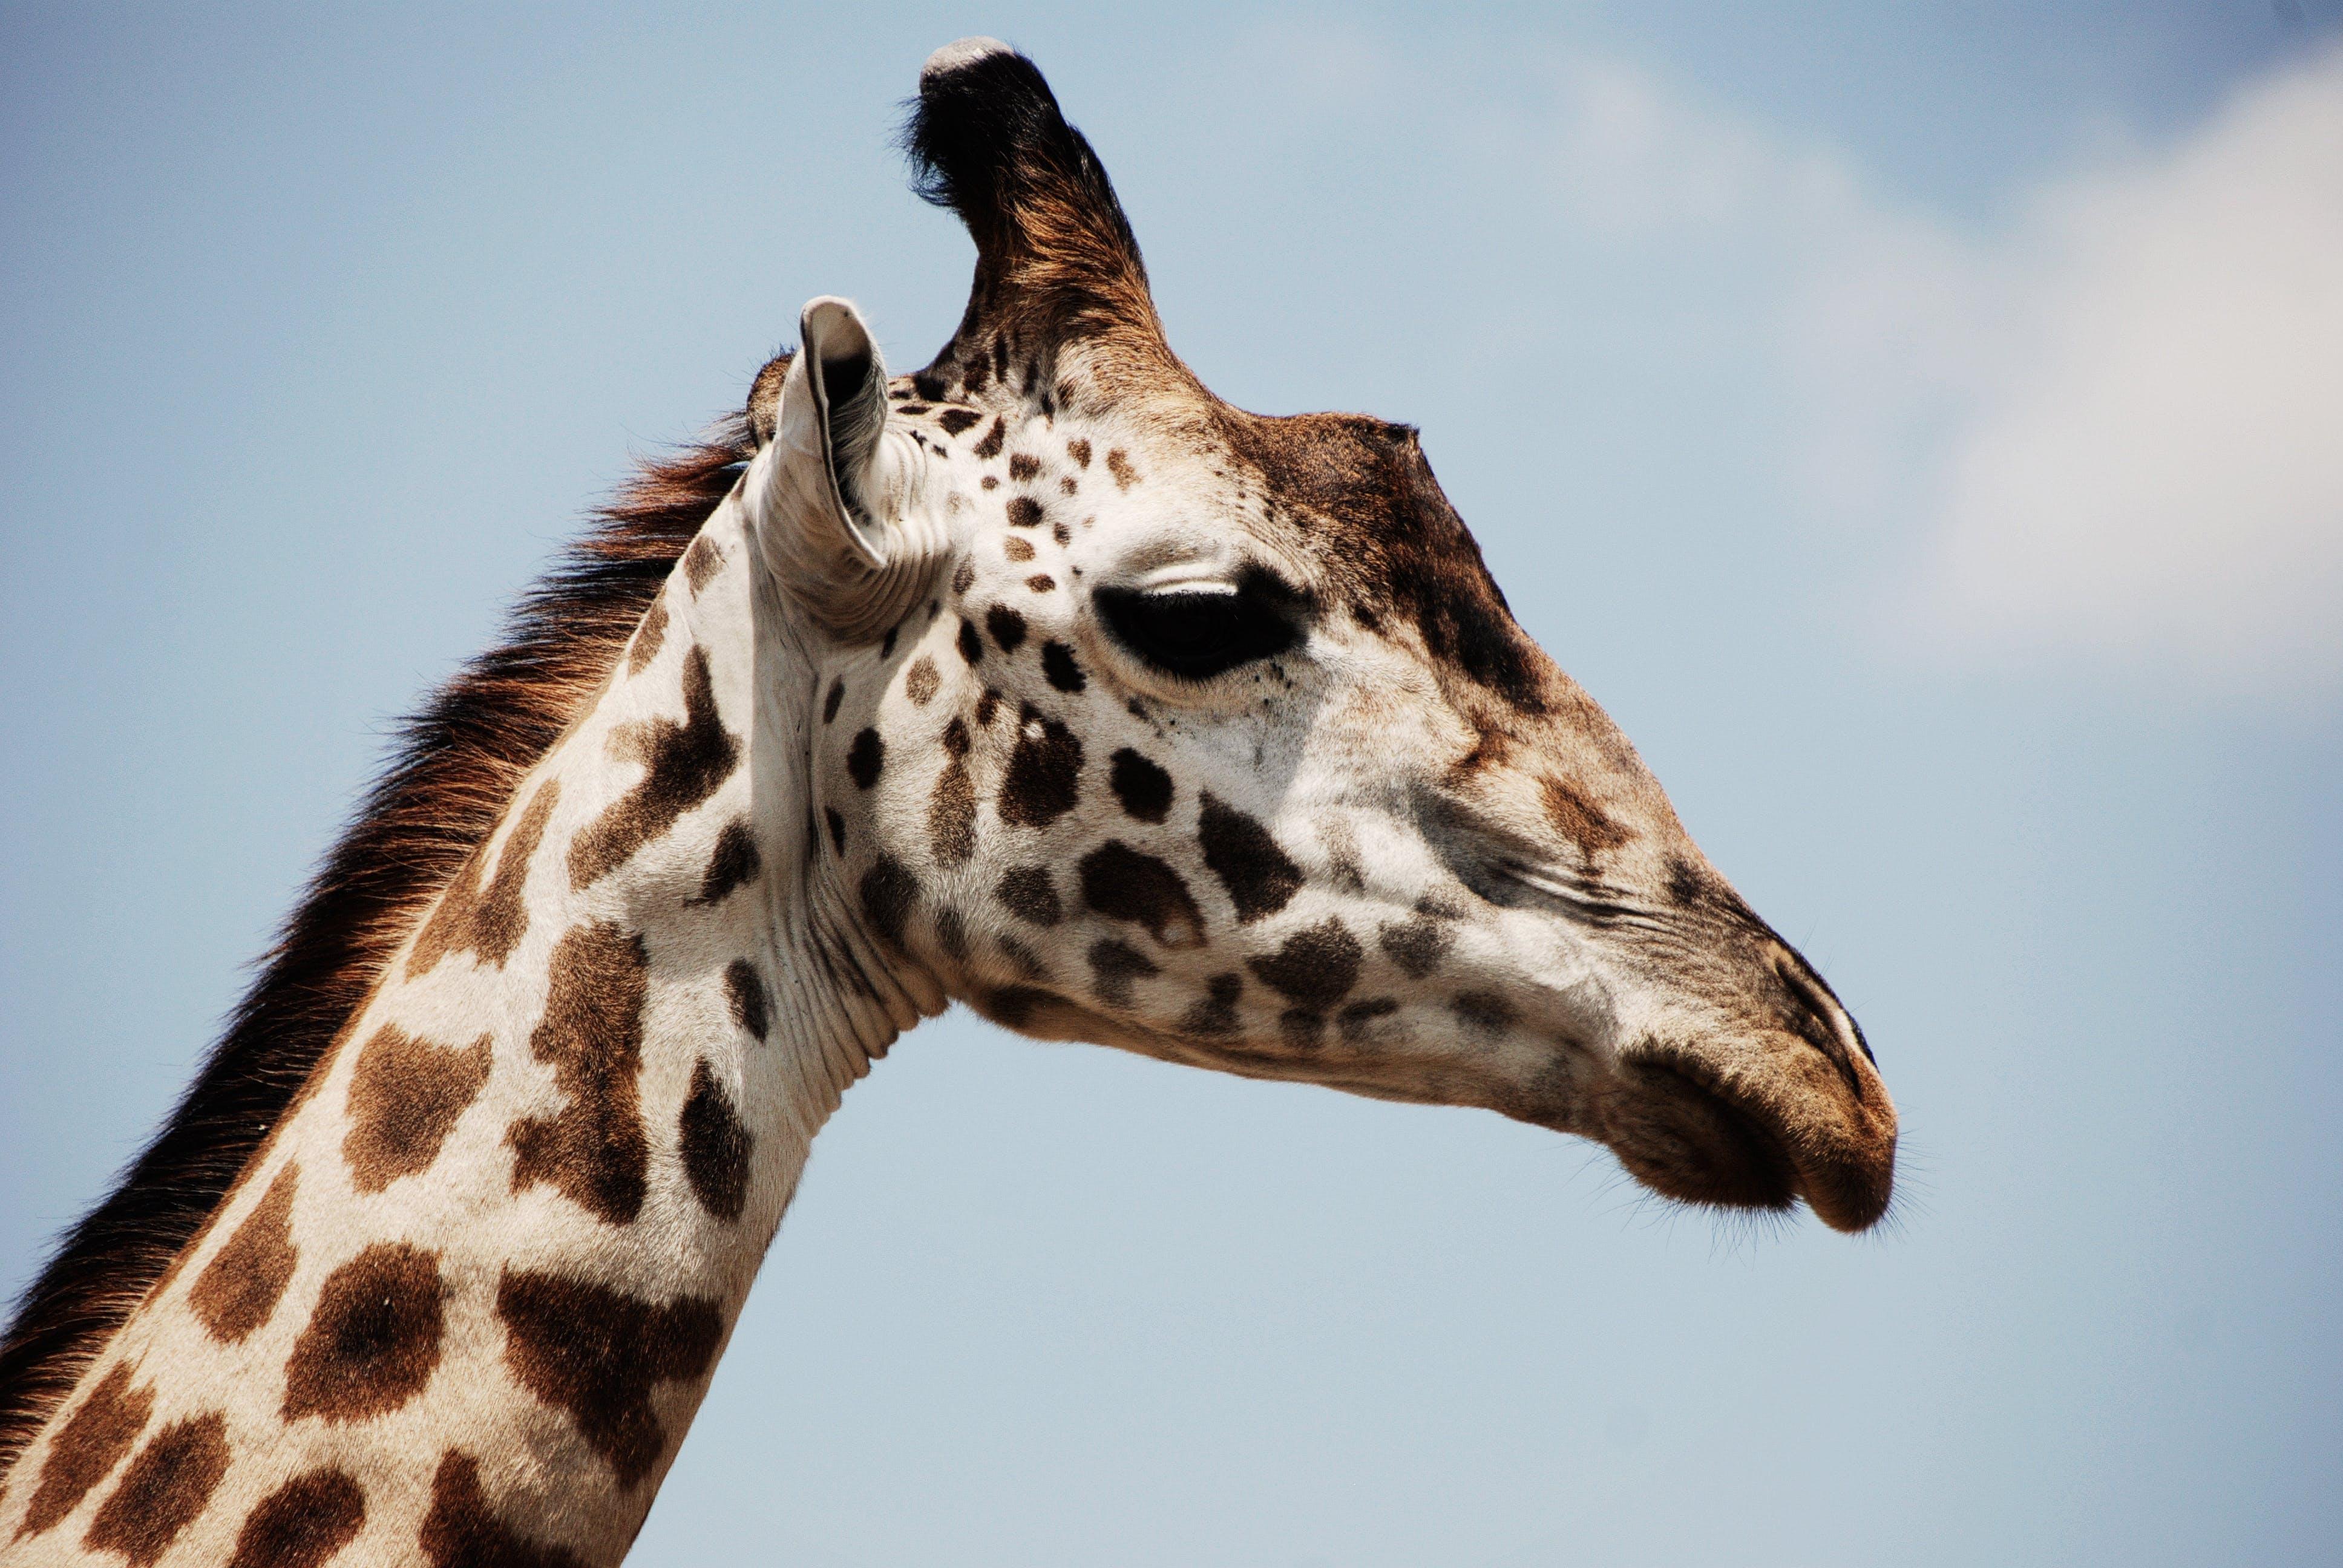 White and Brown Giraffe